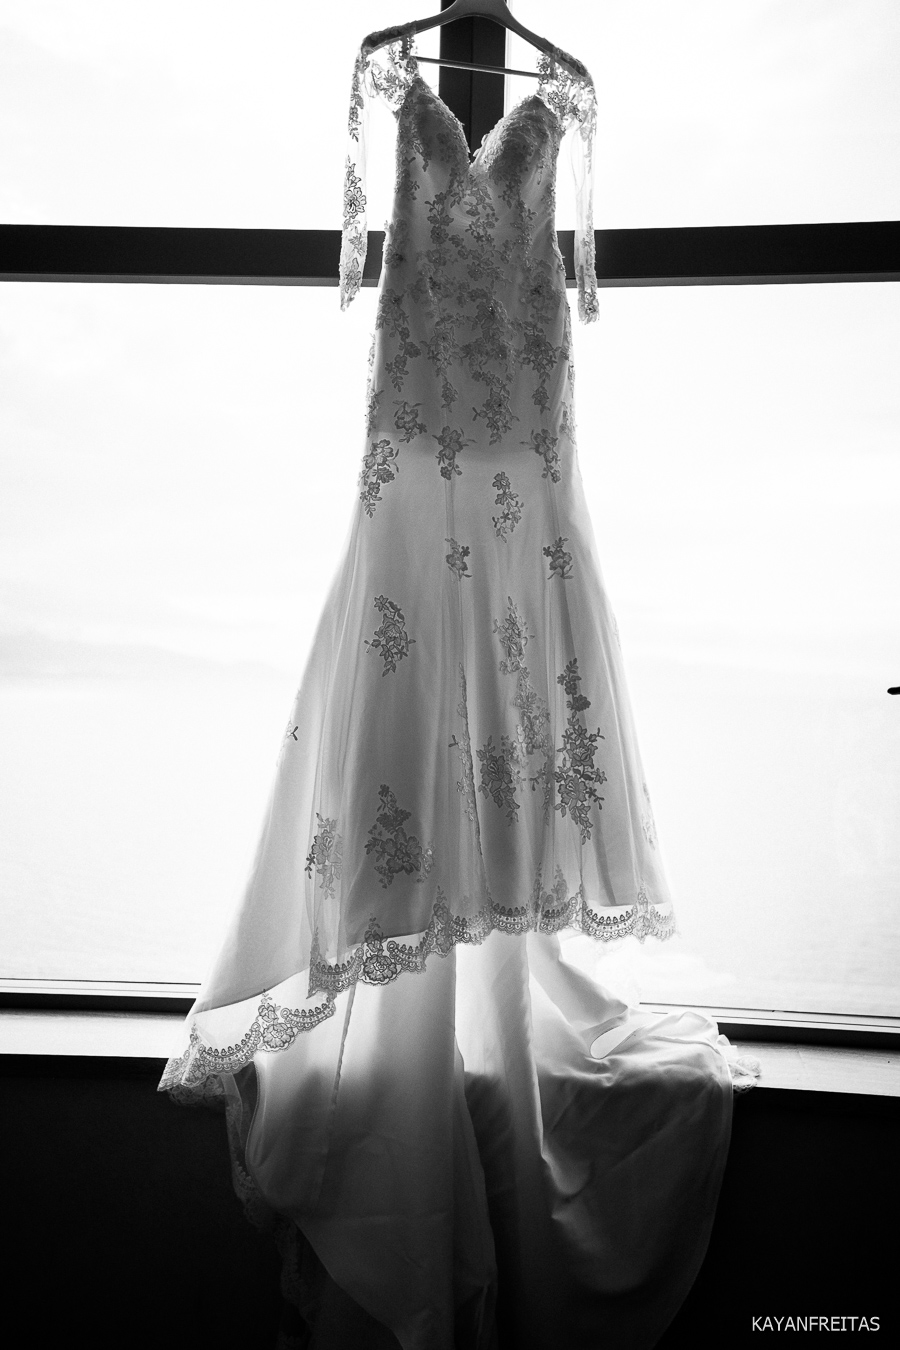 casamento-indaia-floripa-0013 Casamento Indaiá Florianópolis - Deise e Dário